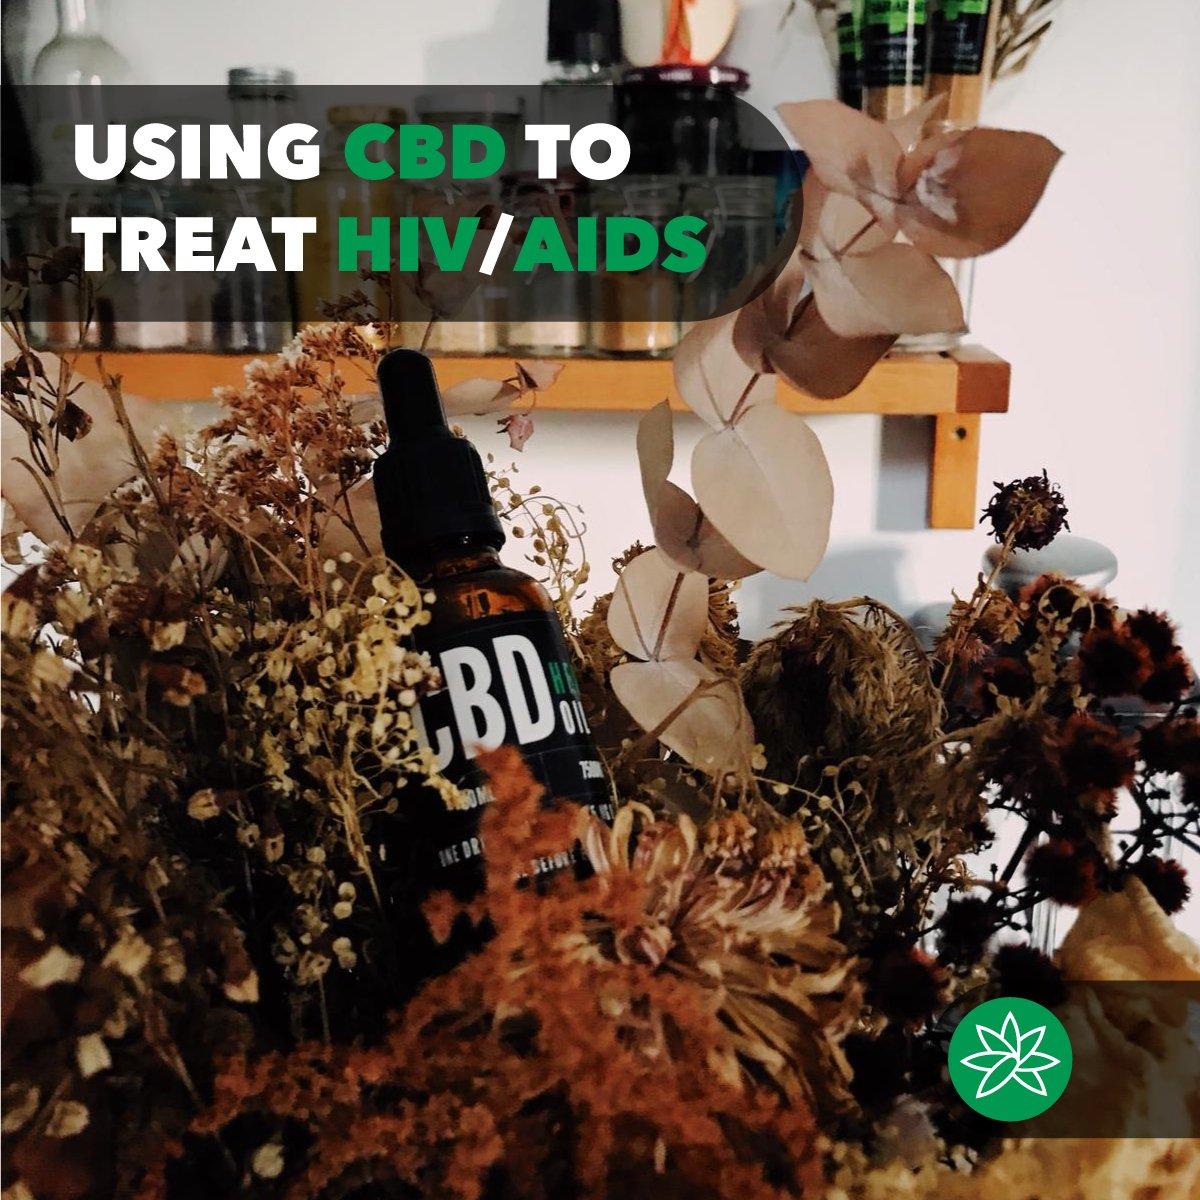 Using CBD to treat HIV/AIDS